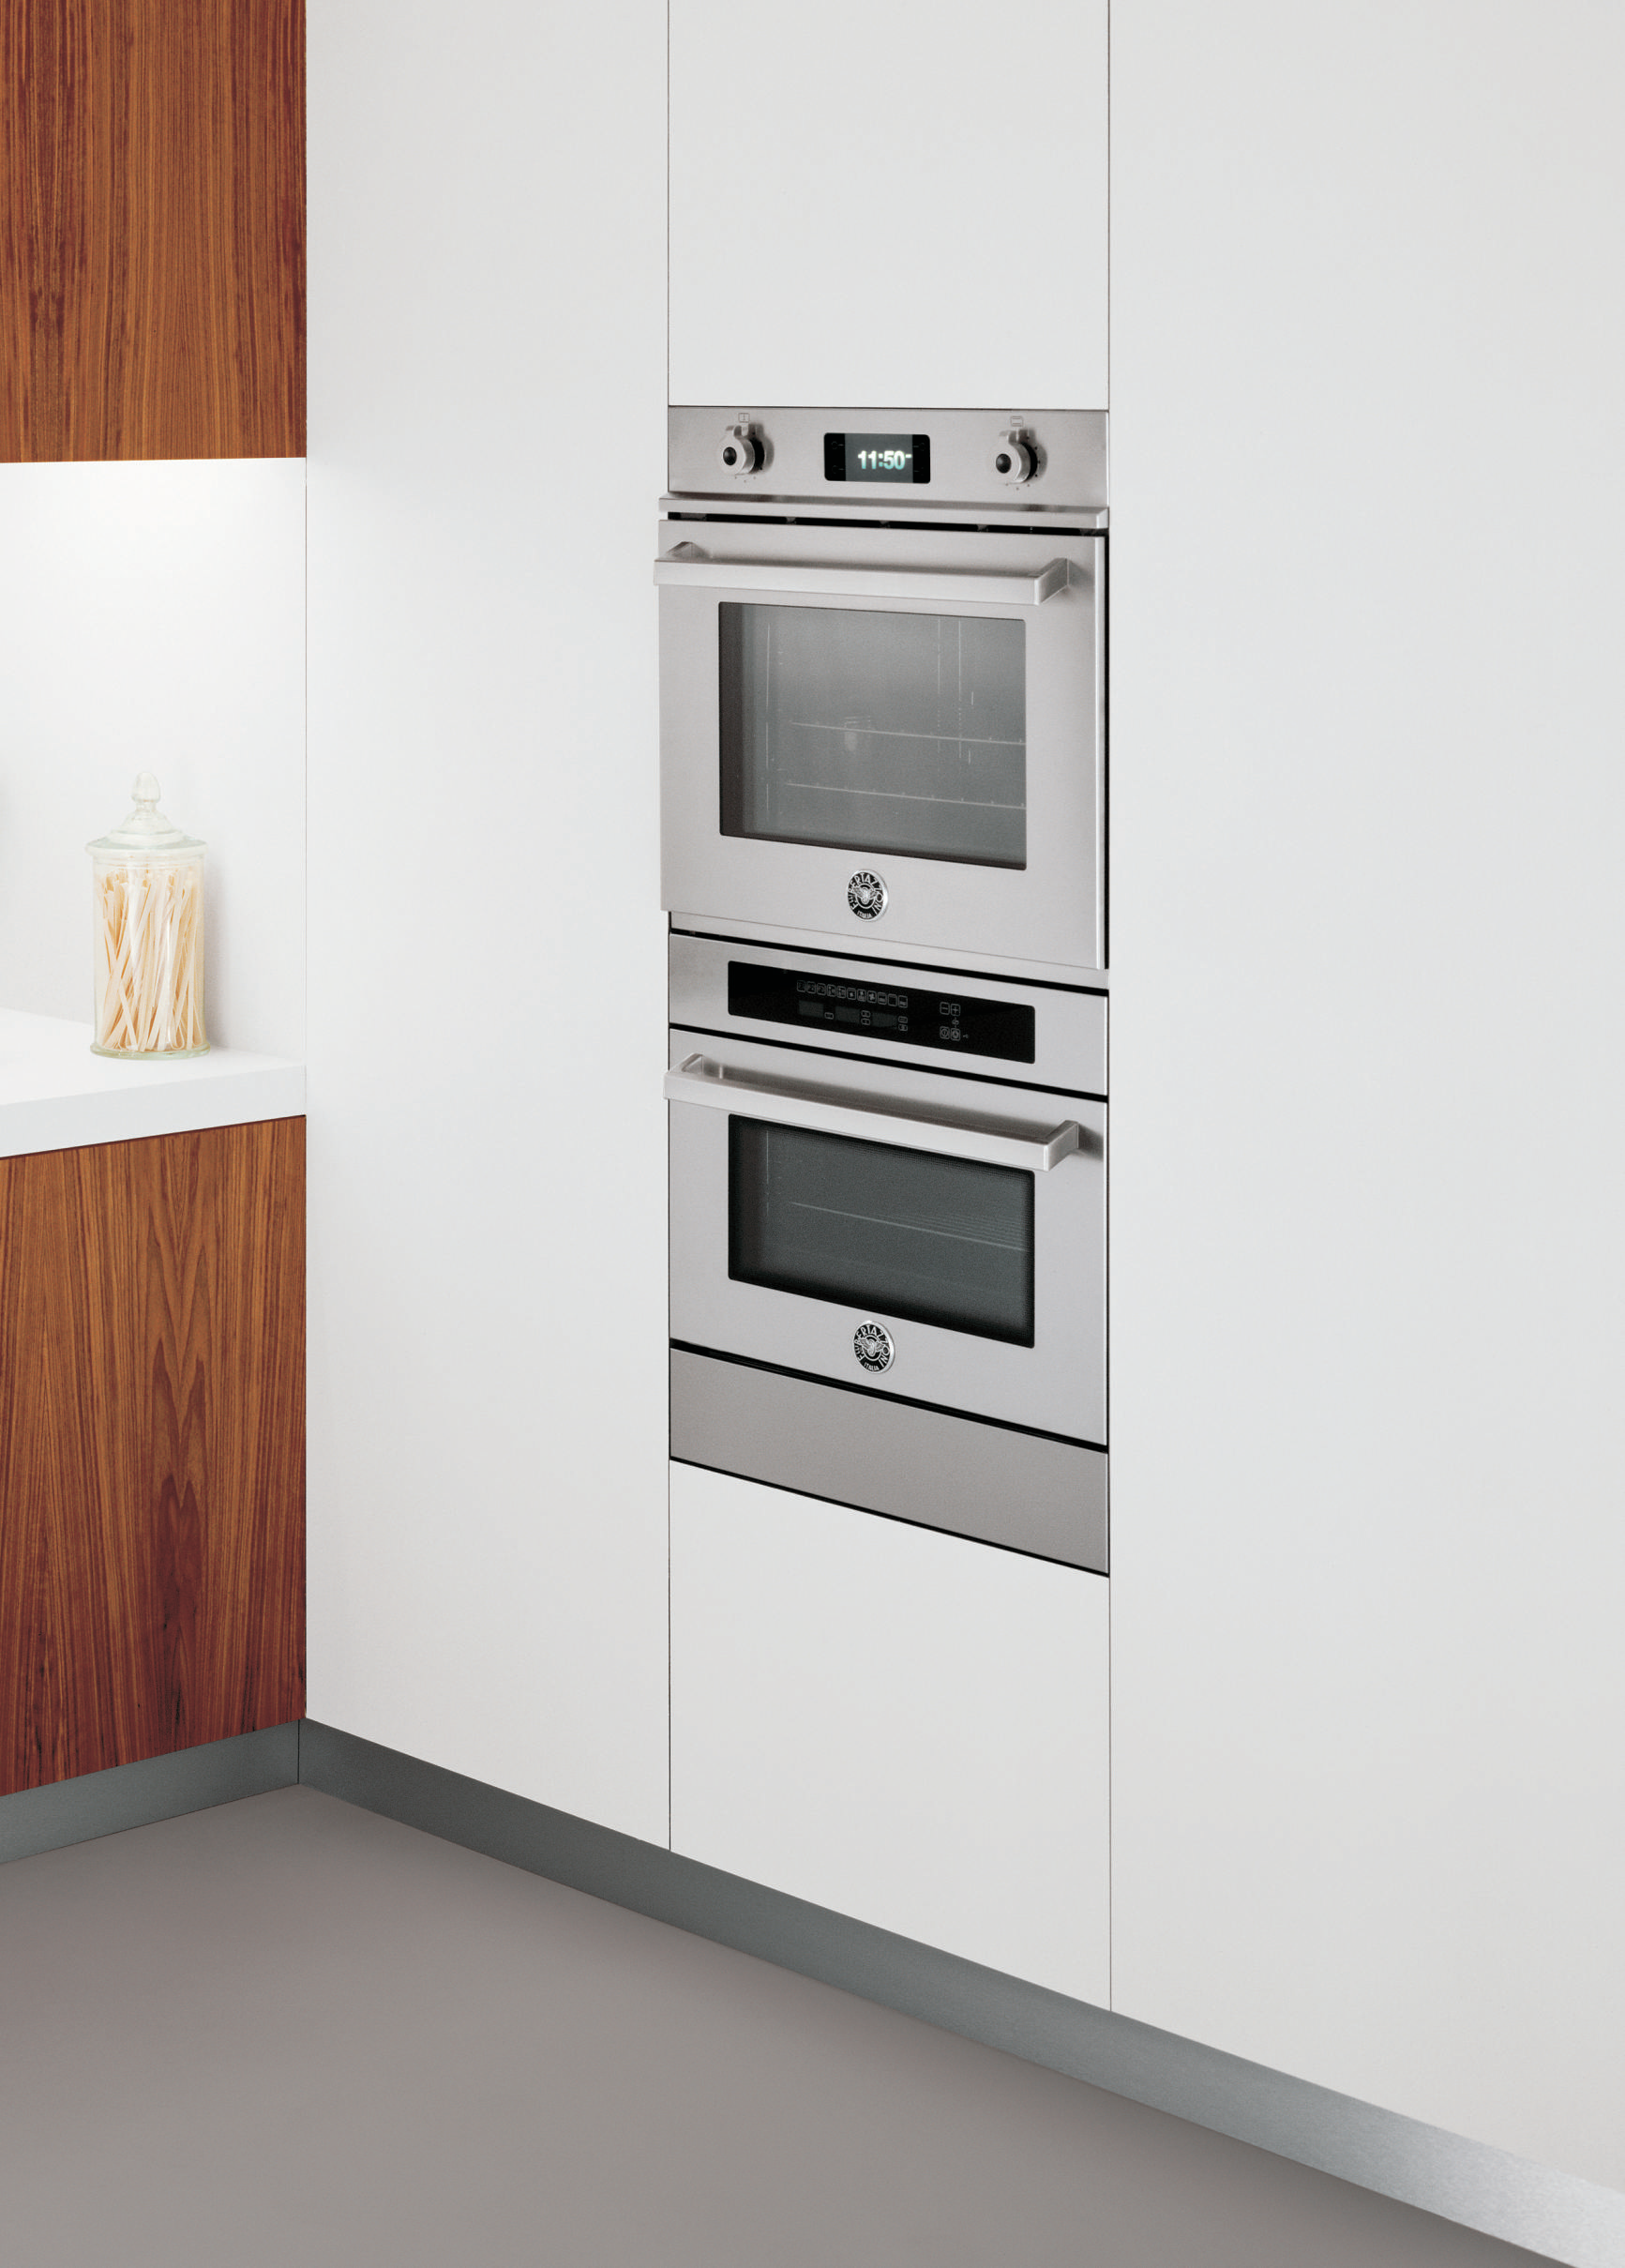 bertazzoni professional series multifunction electric oven 76 cm